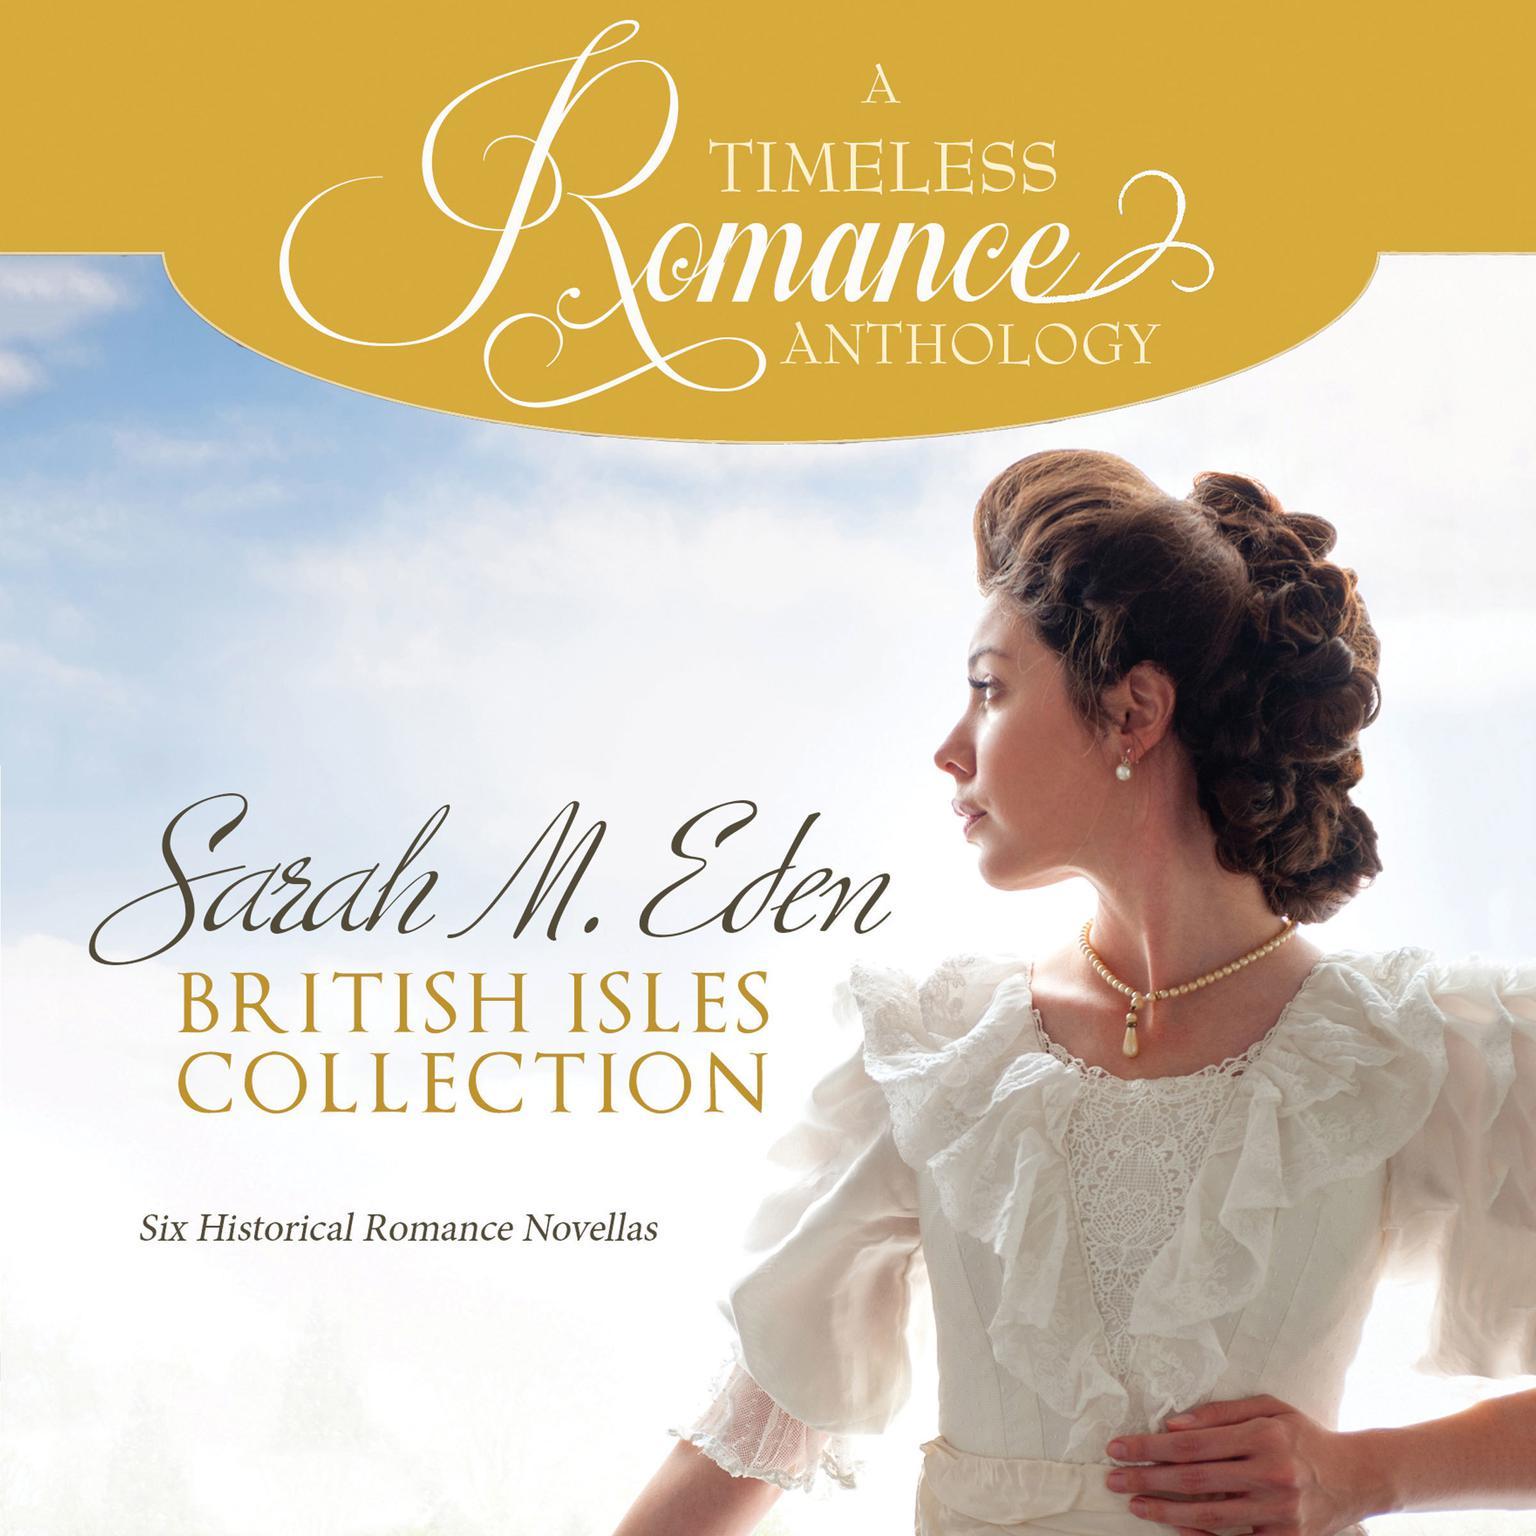 Sarah M. Eden British Isles Collection: Six Historical Romance Novellas Audiobook, by Sarah M. Eden